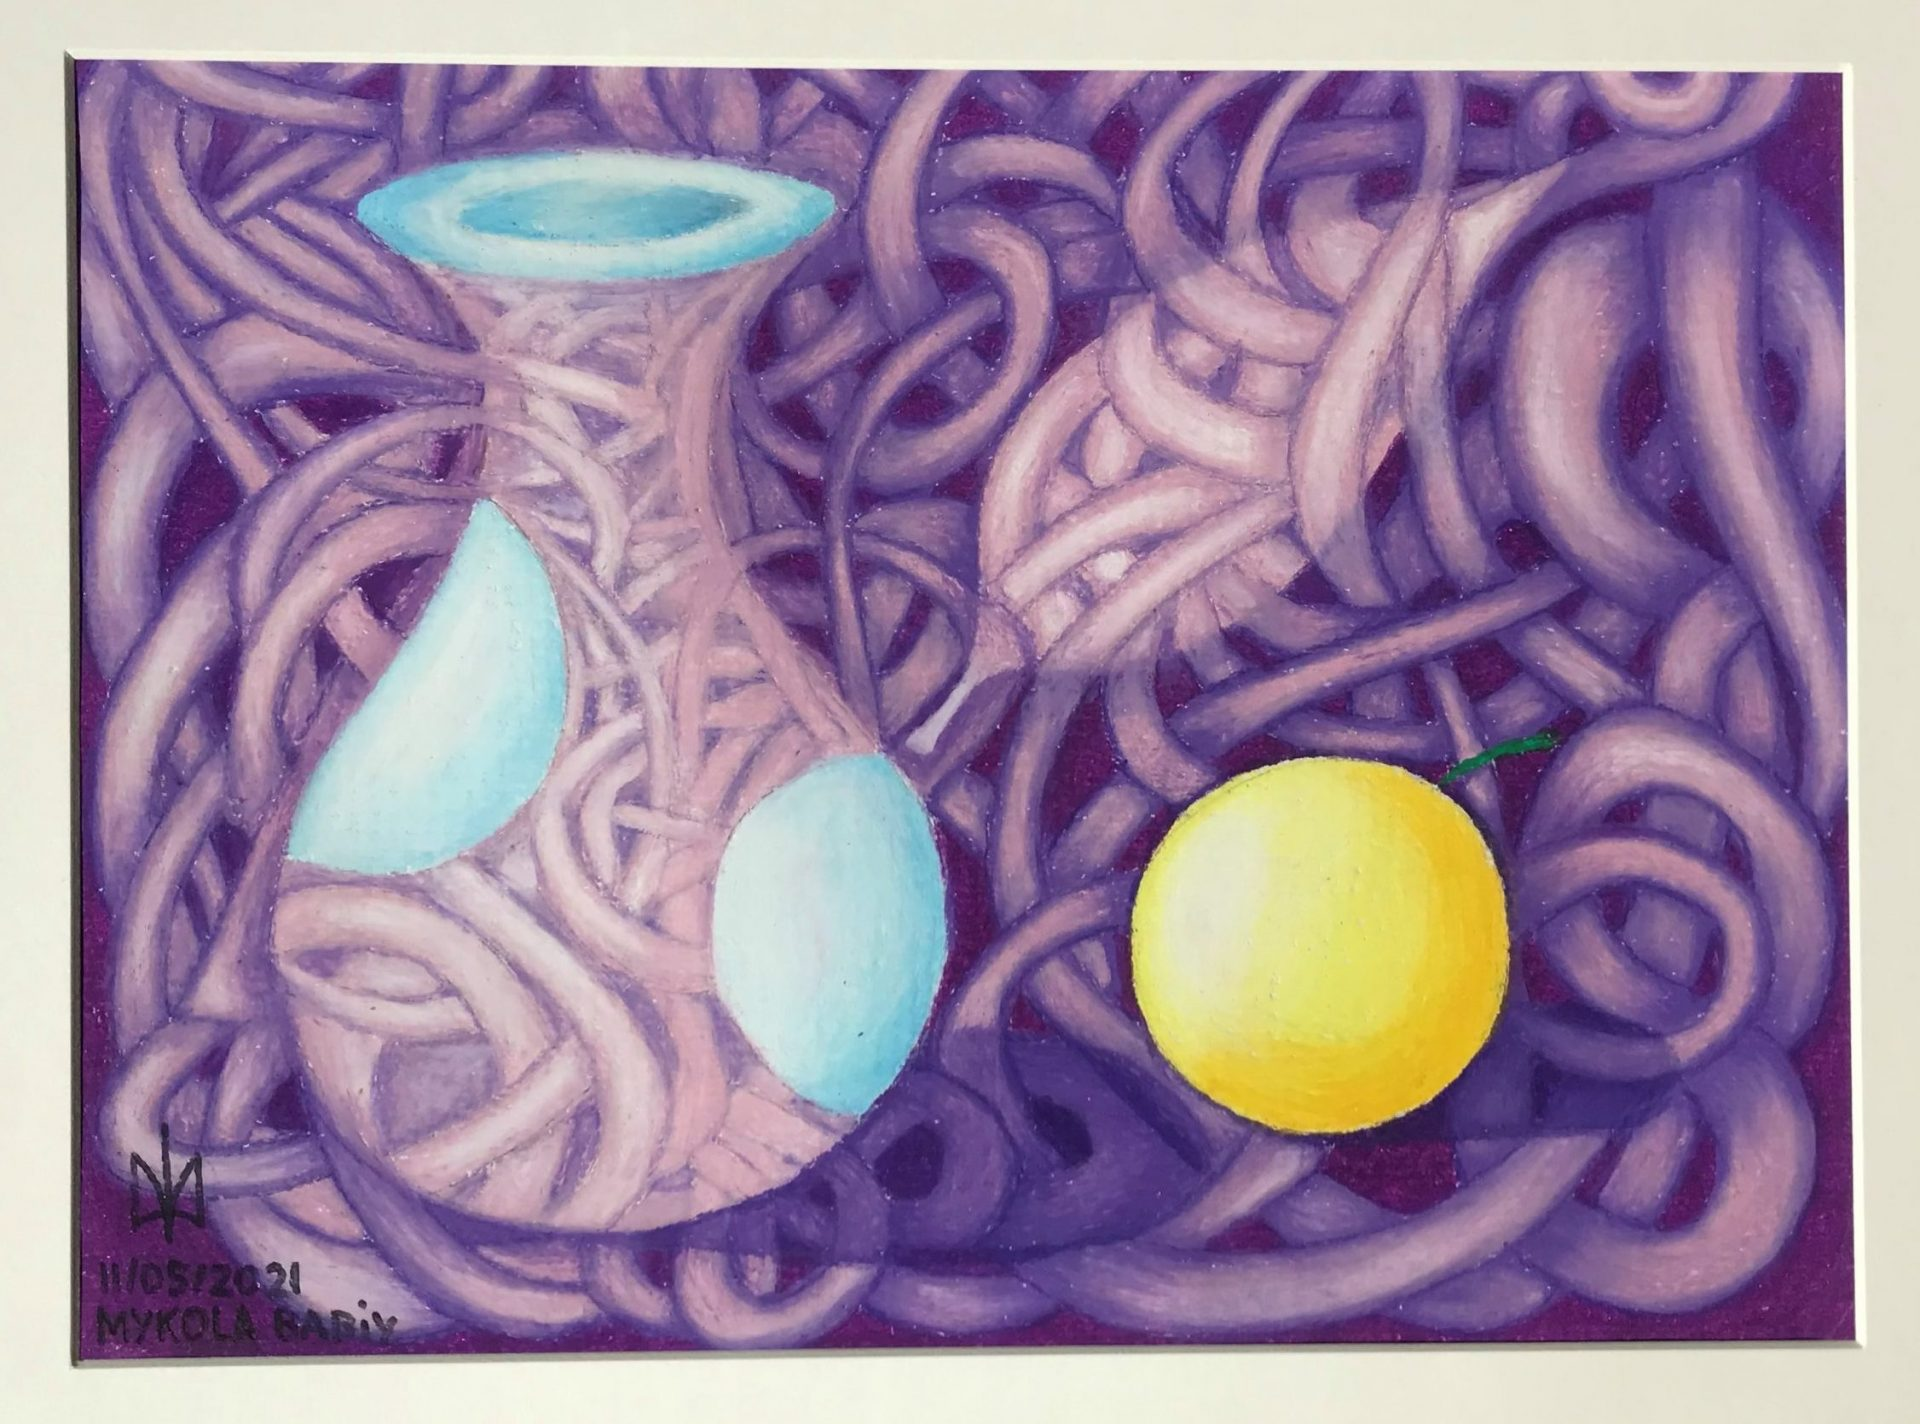 Vase with lemon. Oil pastels. Mykola Babiy.